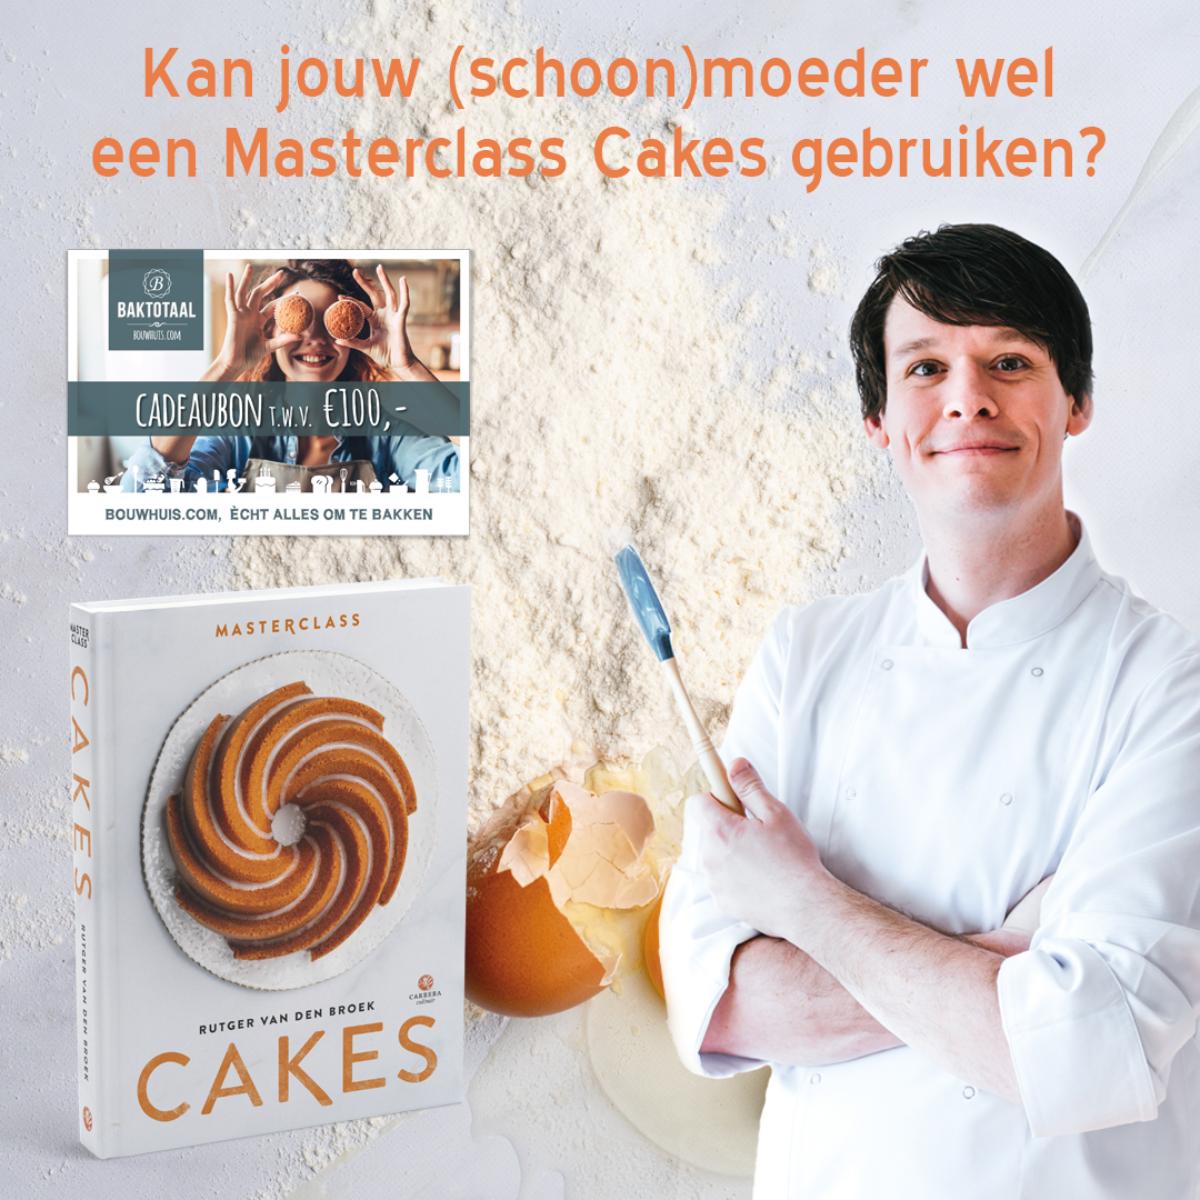 Win 1 van de 10 Masterclass Cakes en 100 euro baktegoed!